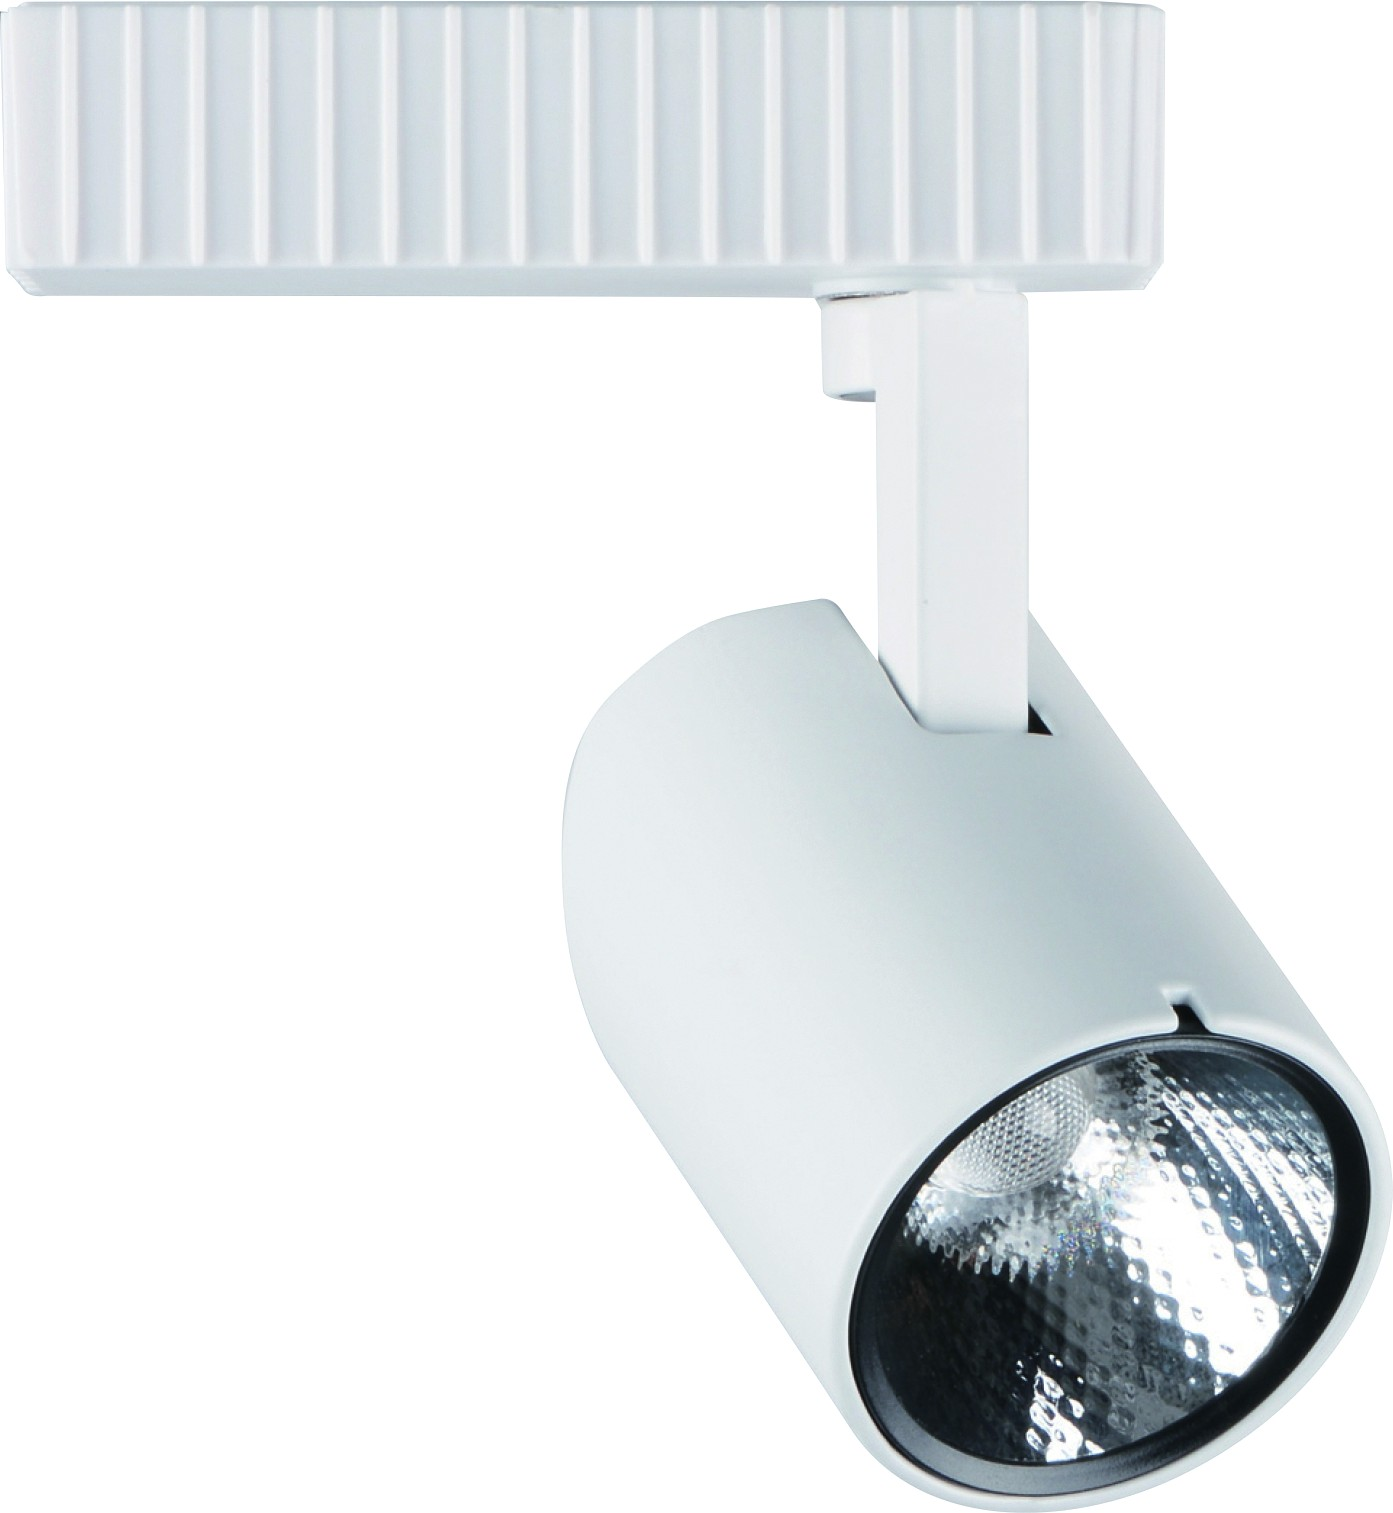 Трек система Arte lamp A3607pl-1wh